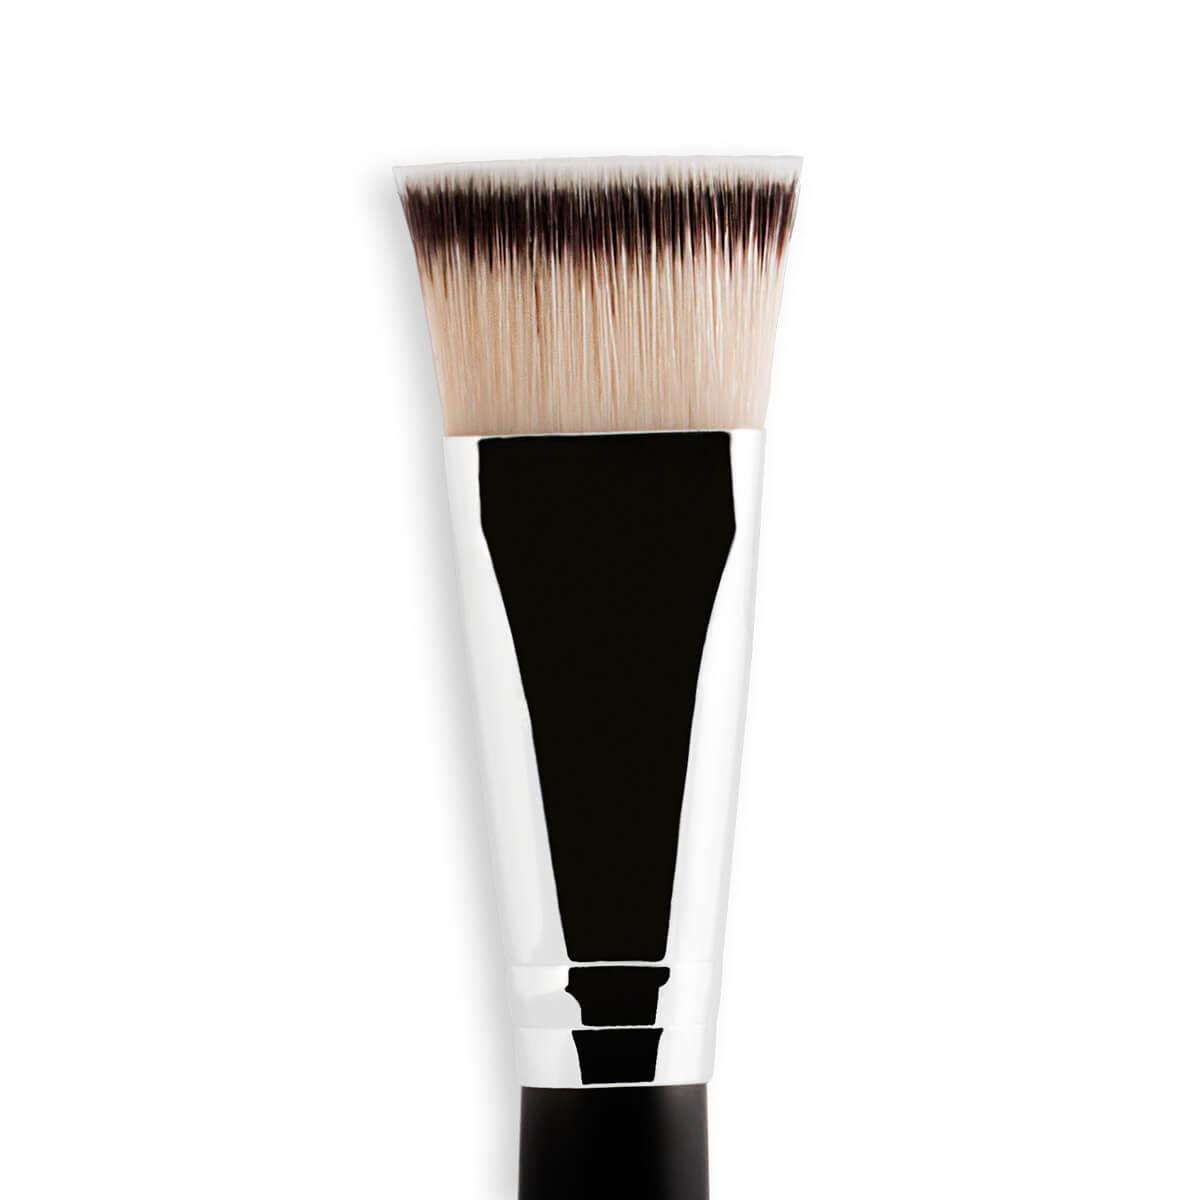 S103 - Pincel Para Contorno Profissional Sffumato Beauty